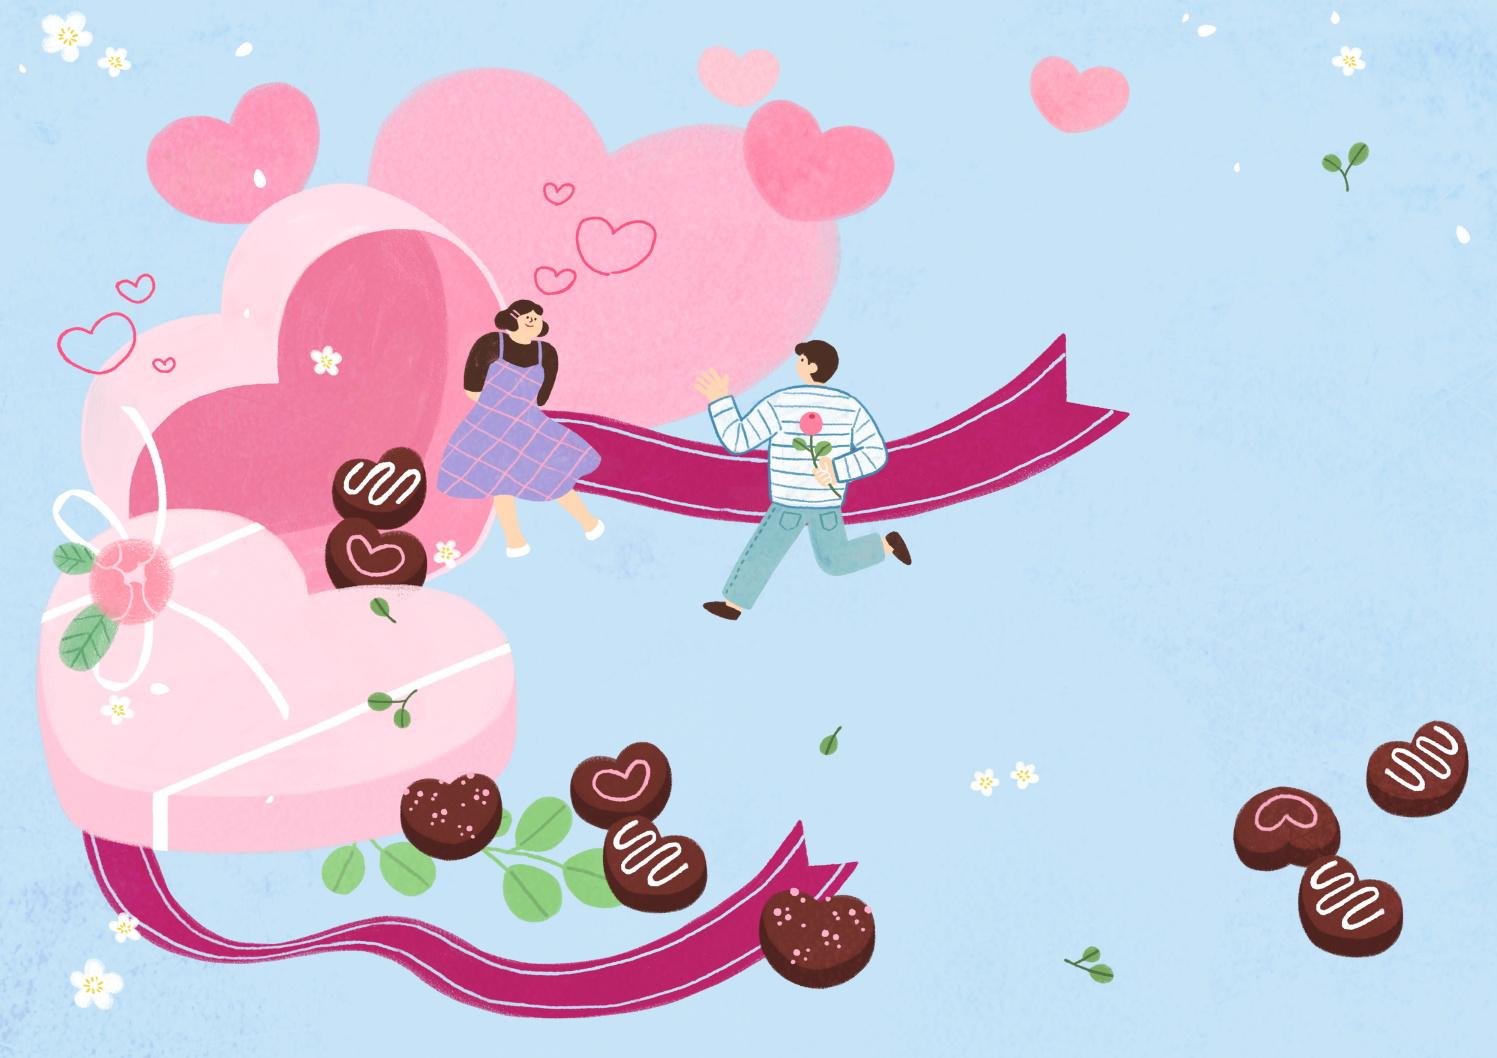 12款情人节七夕情侣手绘插画海报传单设计PSD素材 Valentines Day Couple Hand Drawn Illustration插图7